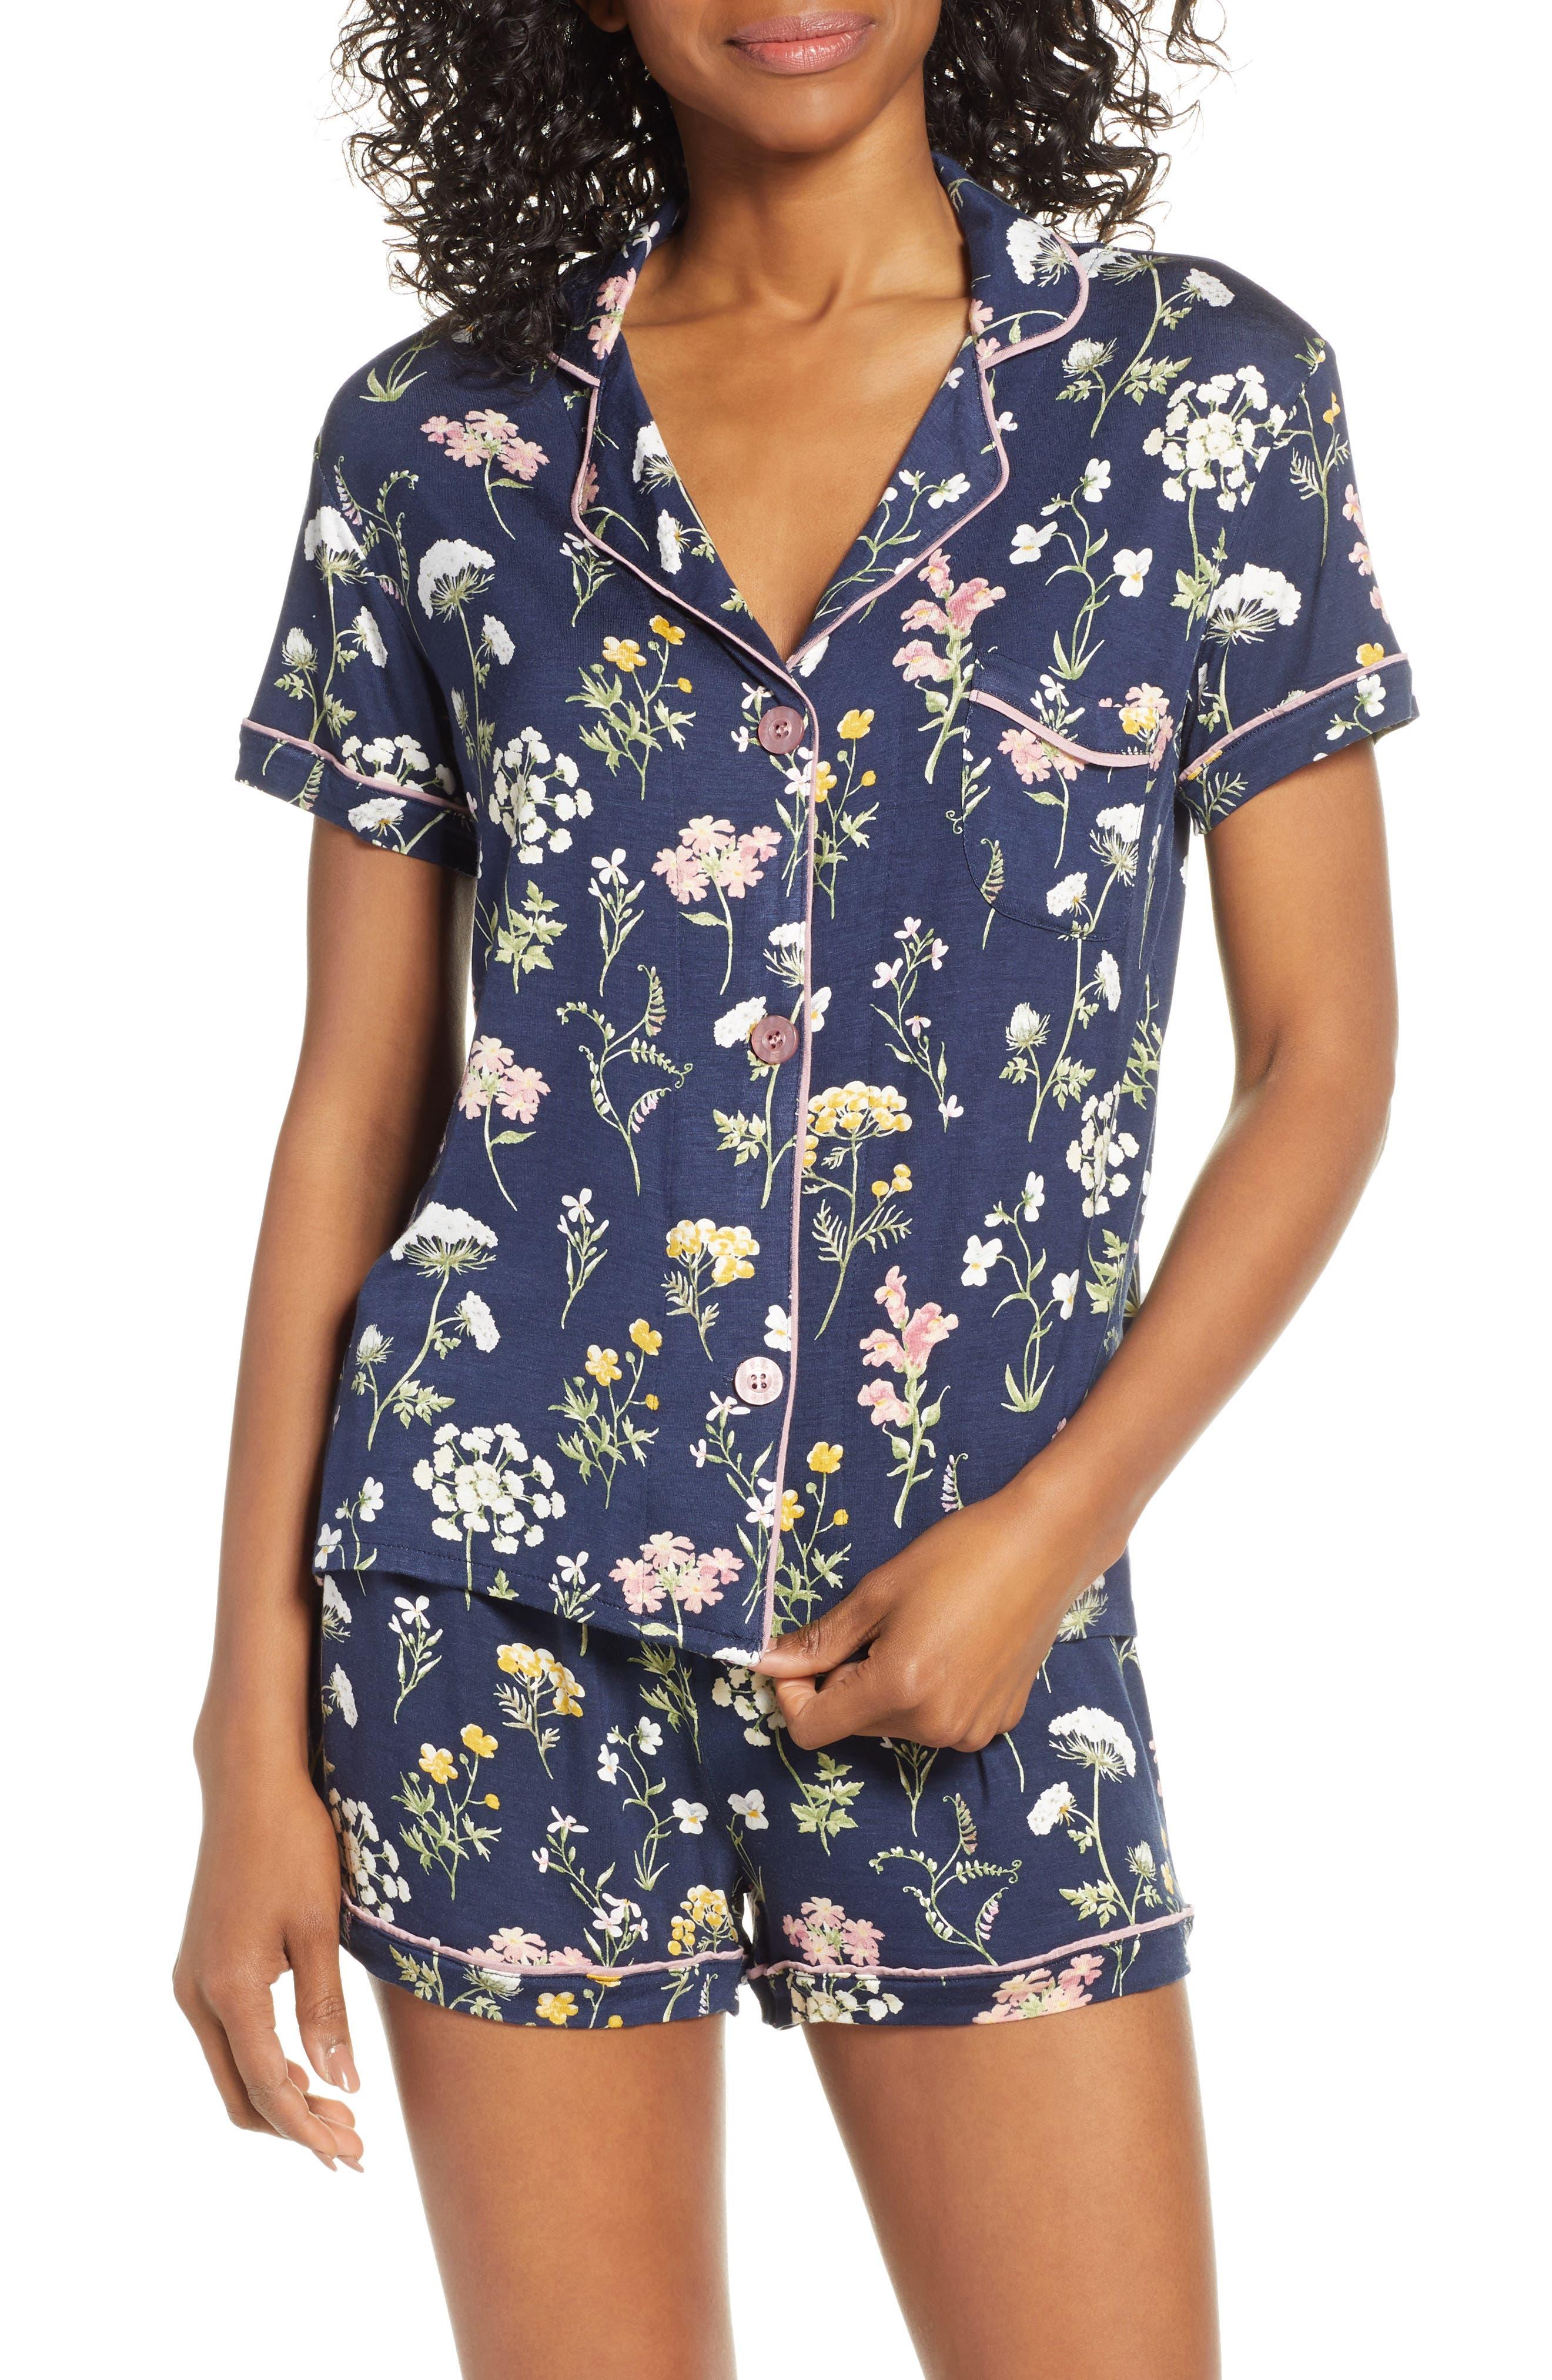 Pj Salvage Dreams Bloom Short Pajamas, Blue